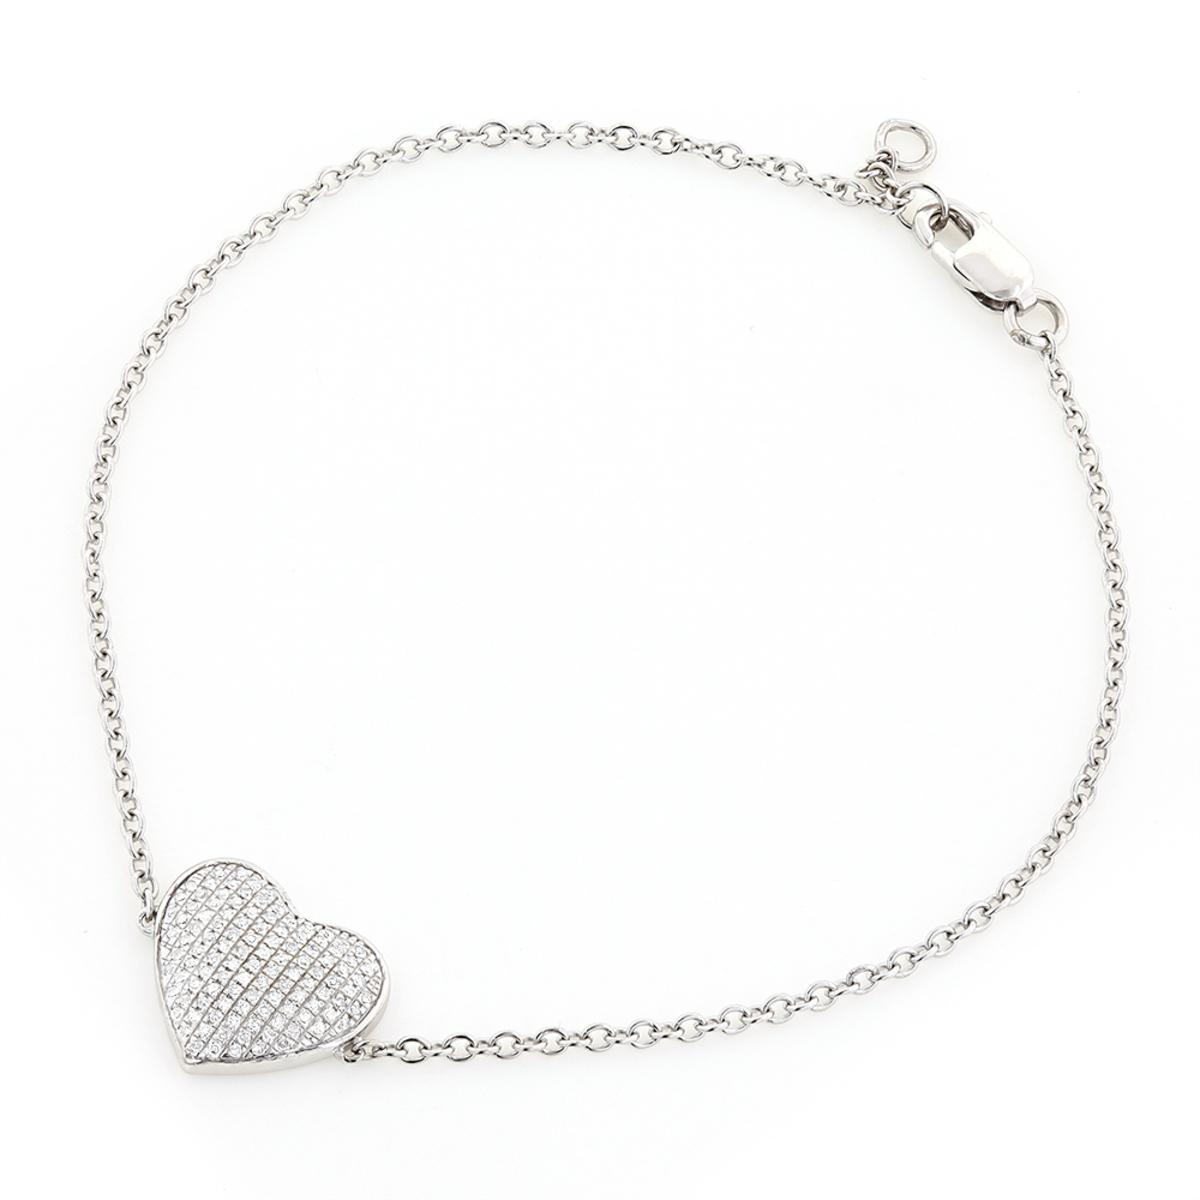 Heart Bracelets 10K Gold Diamond Heart Bracelet 1/5ct